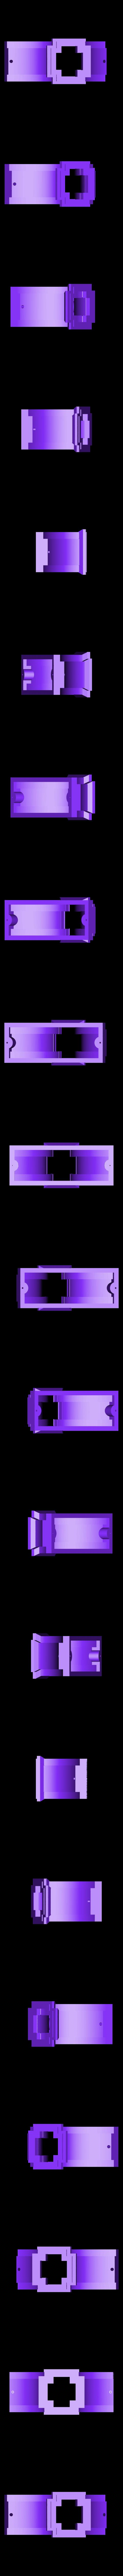 LBLUC_foot_base.stl Download free STL file Led bridge lamp Universal Segment • 3D printable design, Opossums